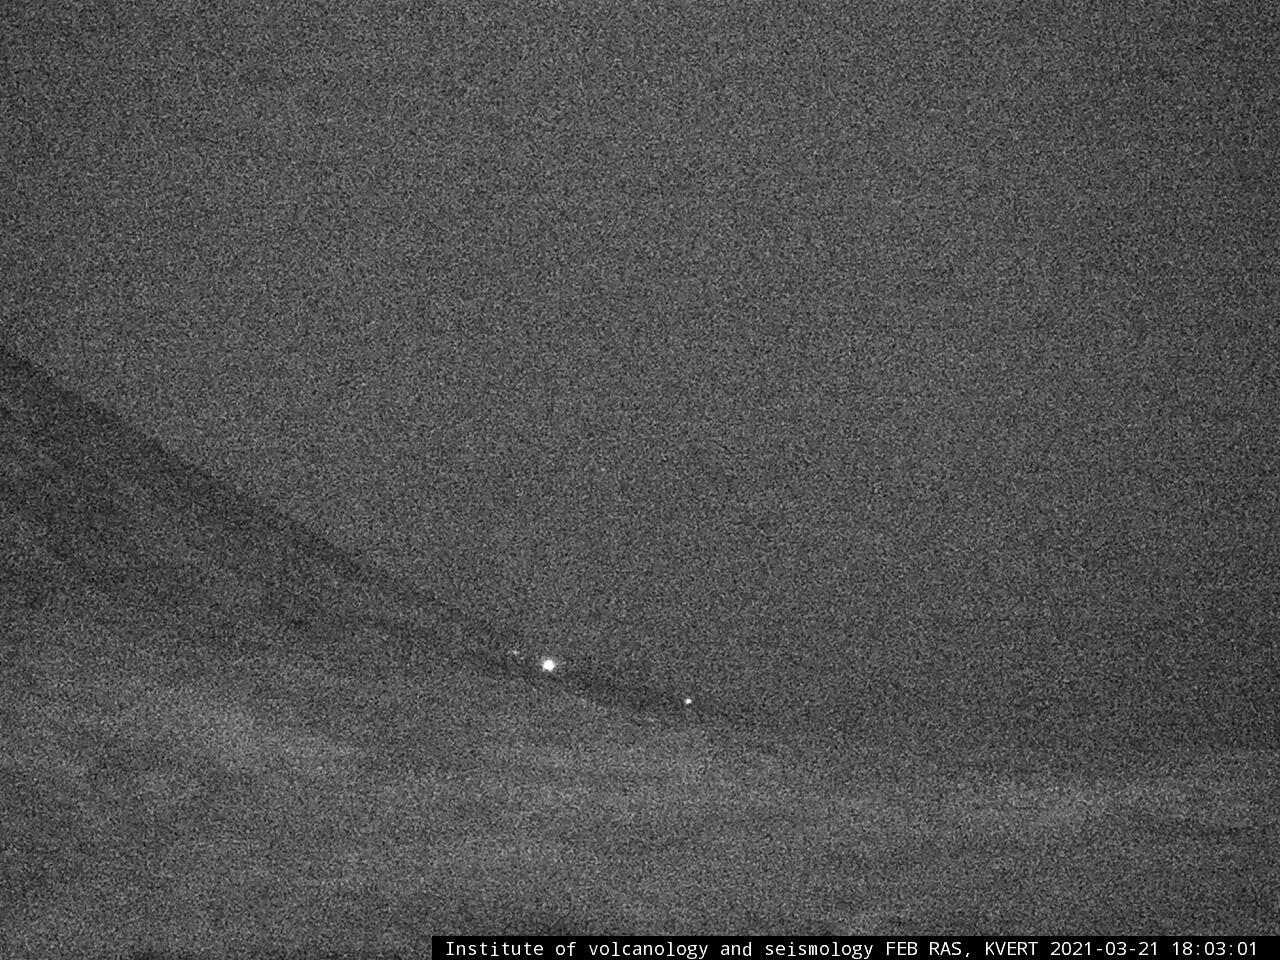 Weakening glow over the past few days from the cinder cone of Klyuchevskoy volcano indicates gradually decreasing activity (image: KVERT)